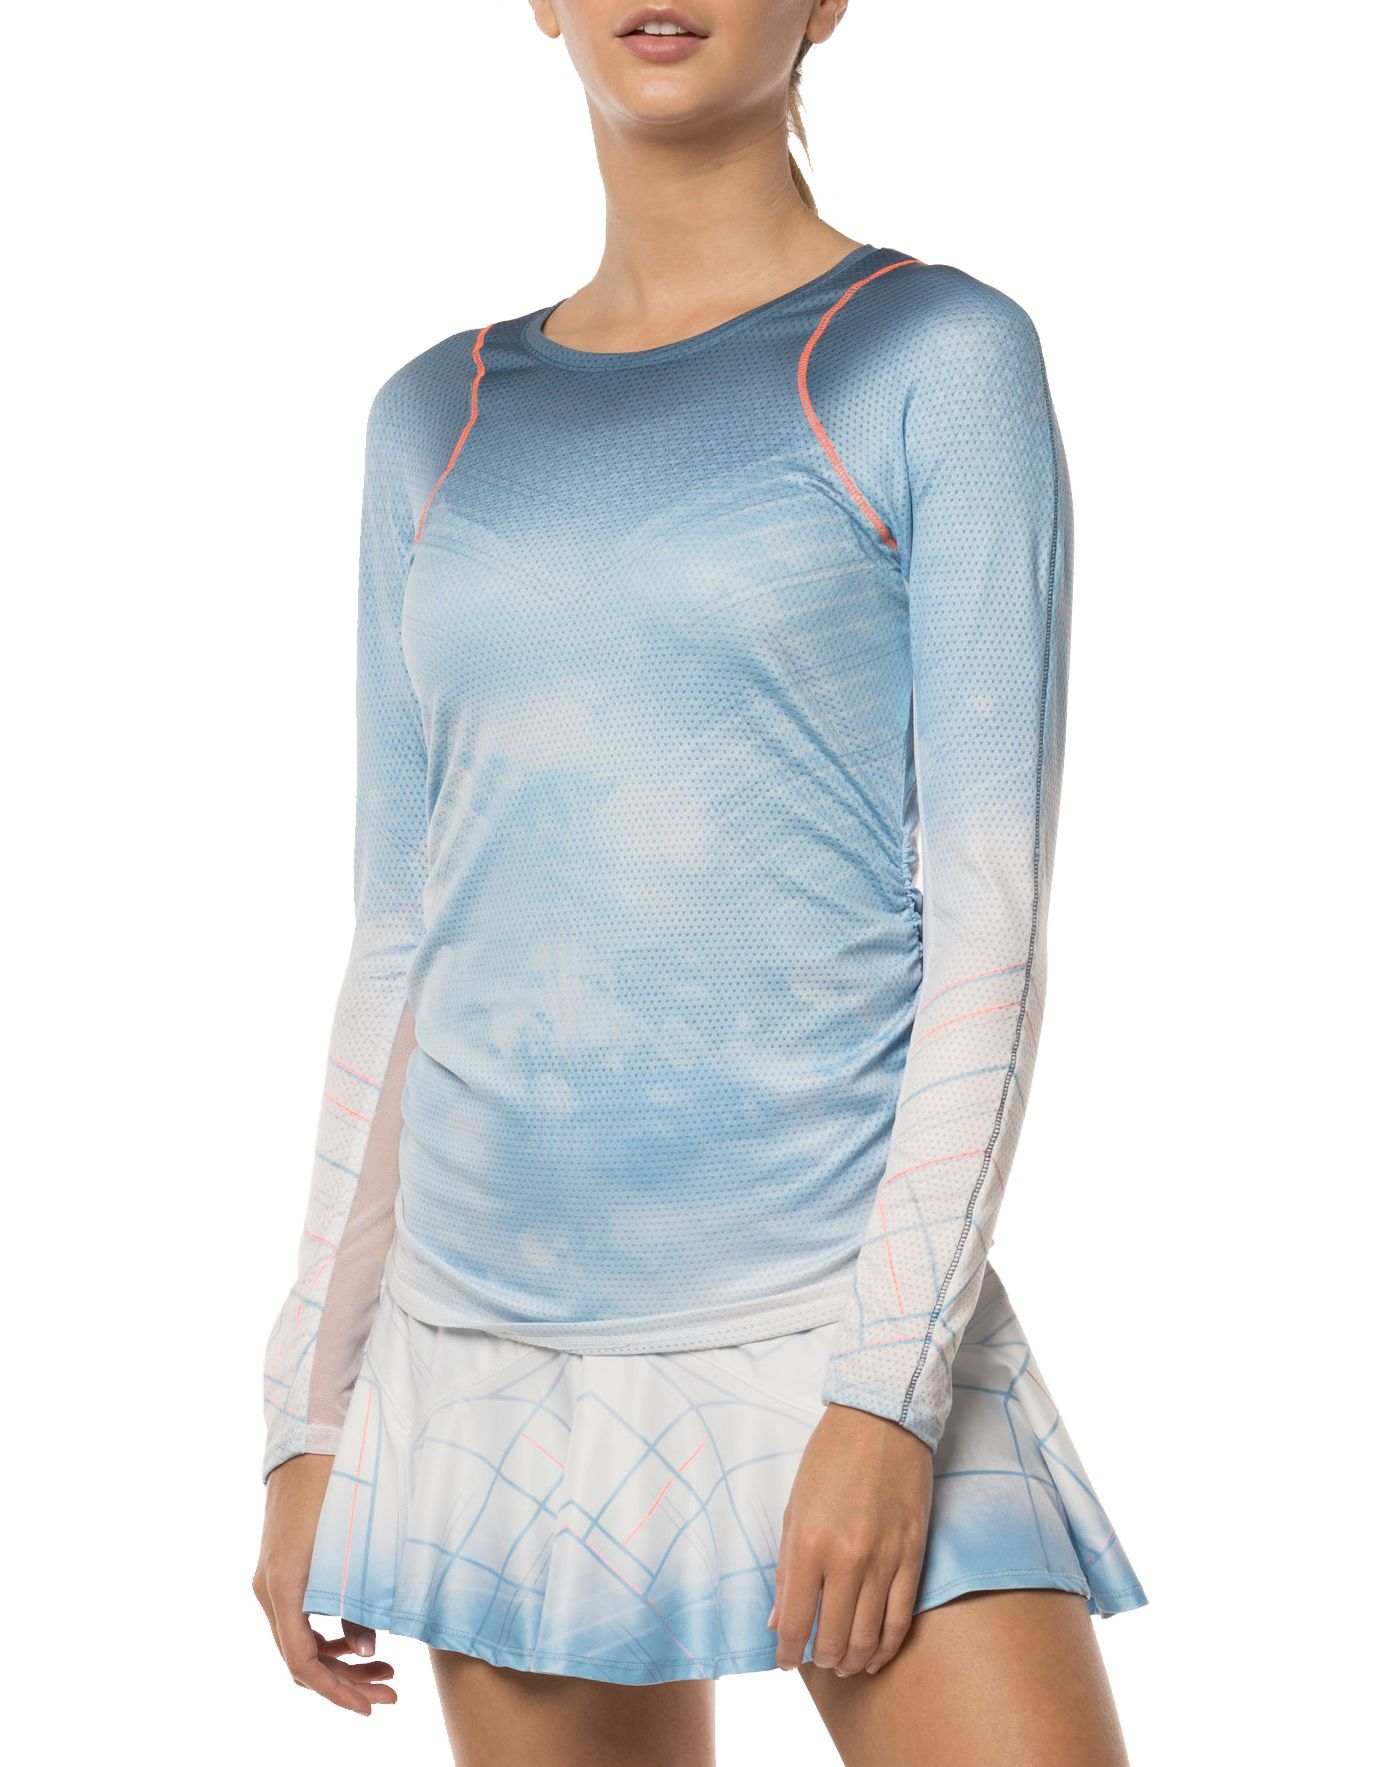 Lucky In Love Women's Celestial Long Sleeve Tennis Shirt